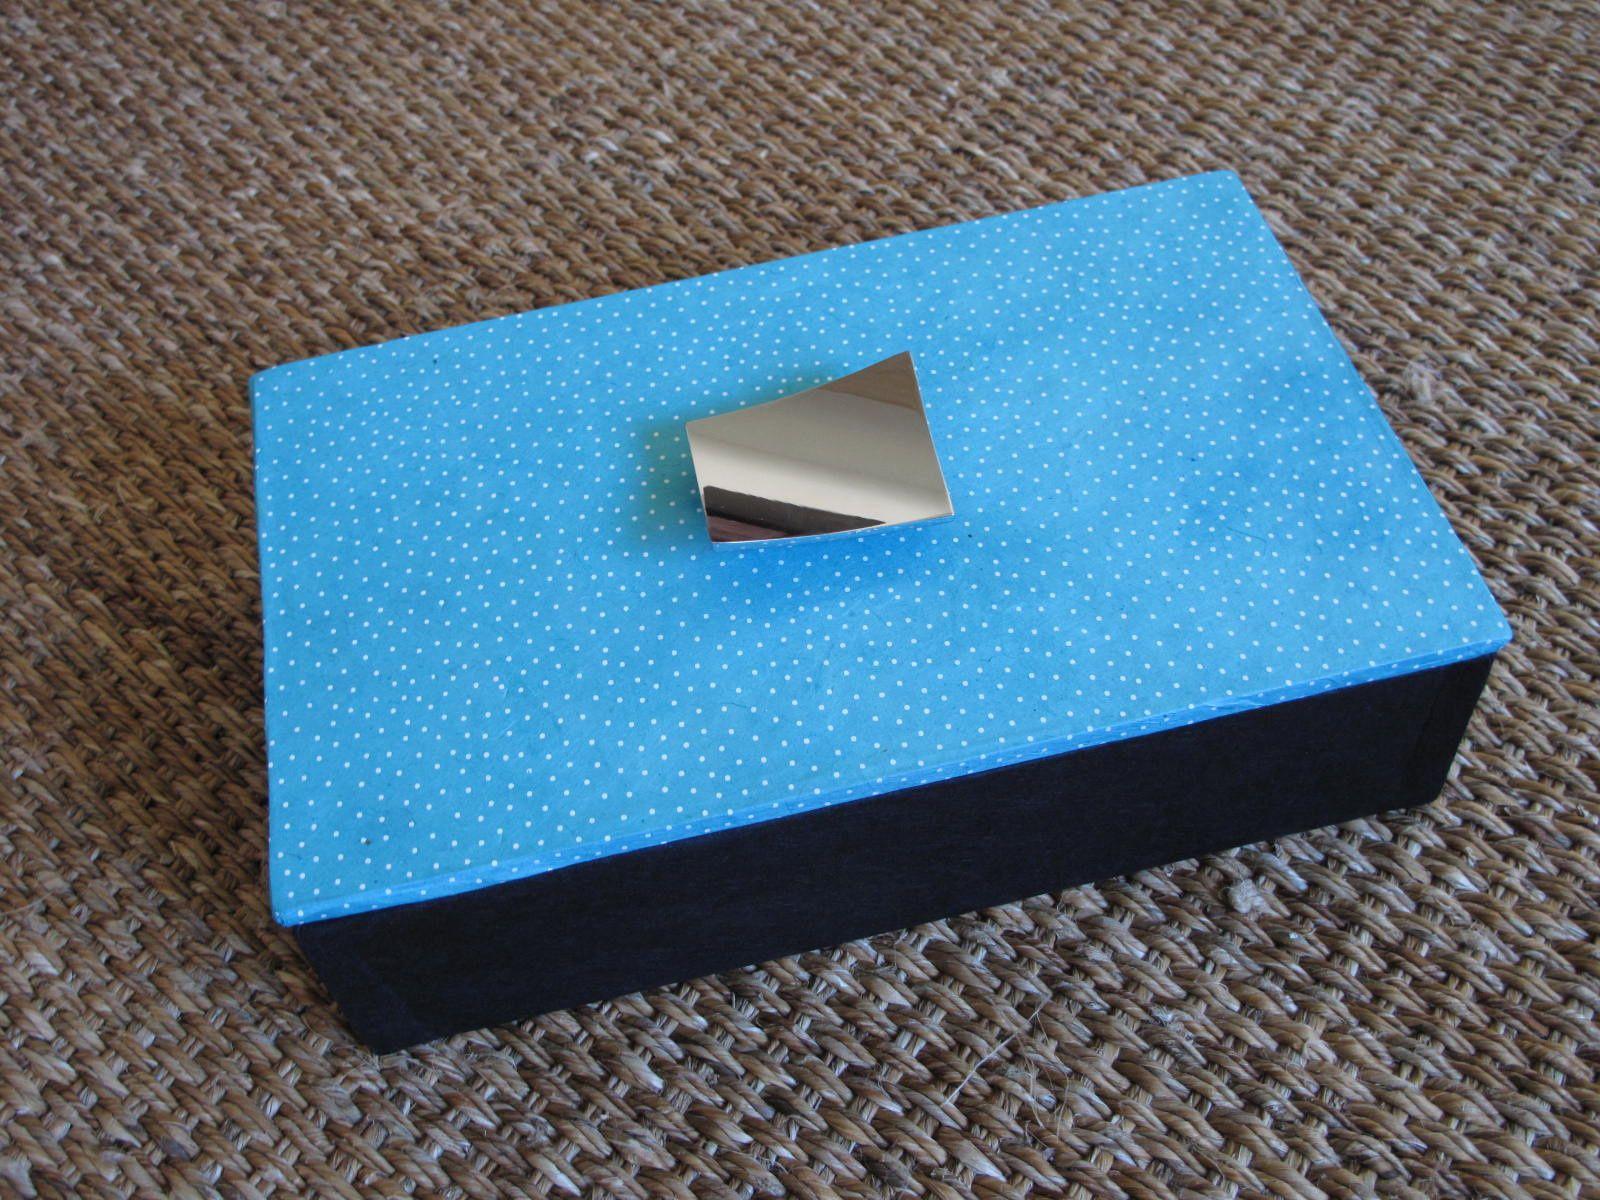 Mes petits cr ation de meubles en carton et autres ob - Mobilier carton recycle ...